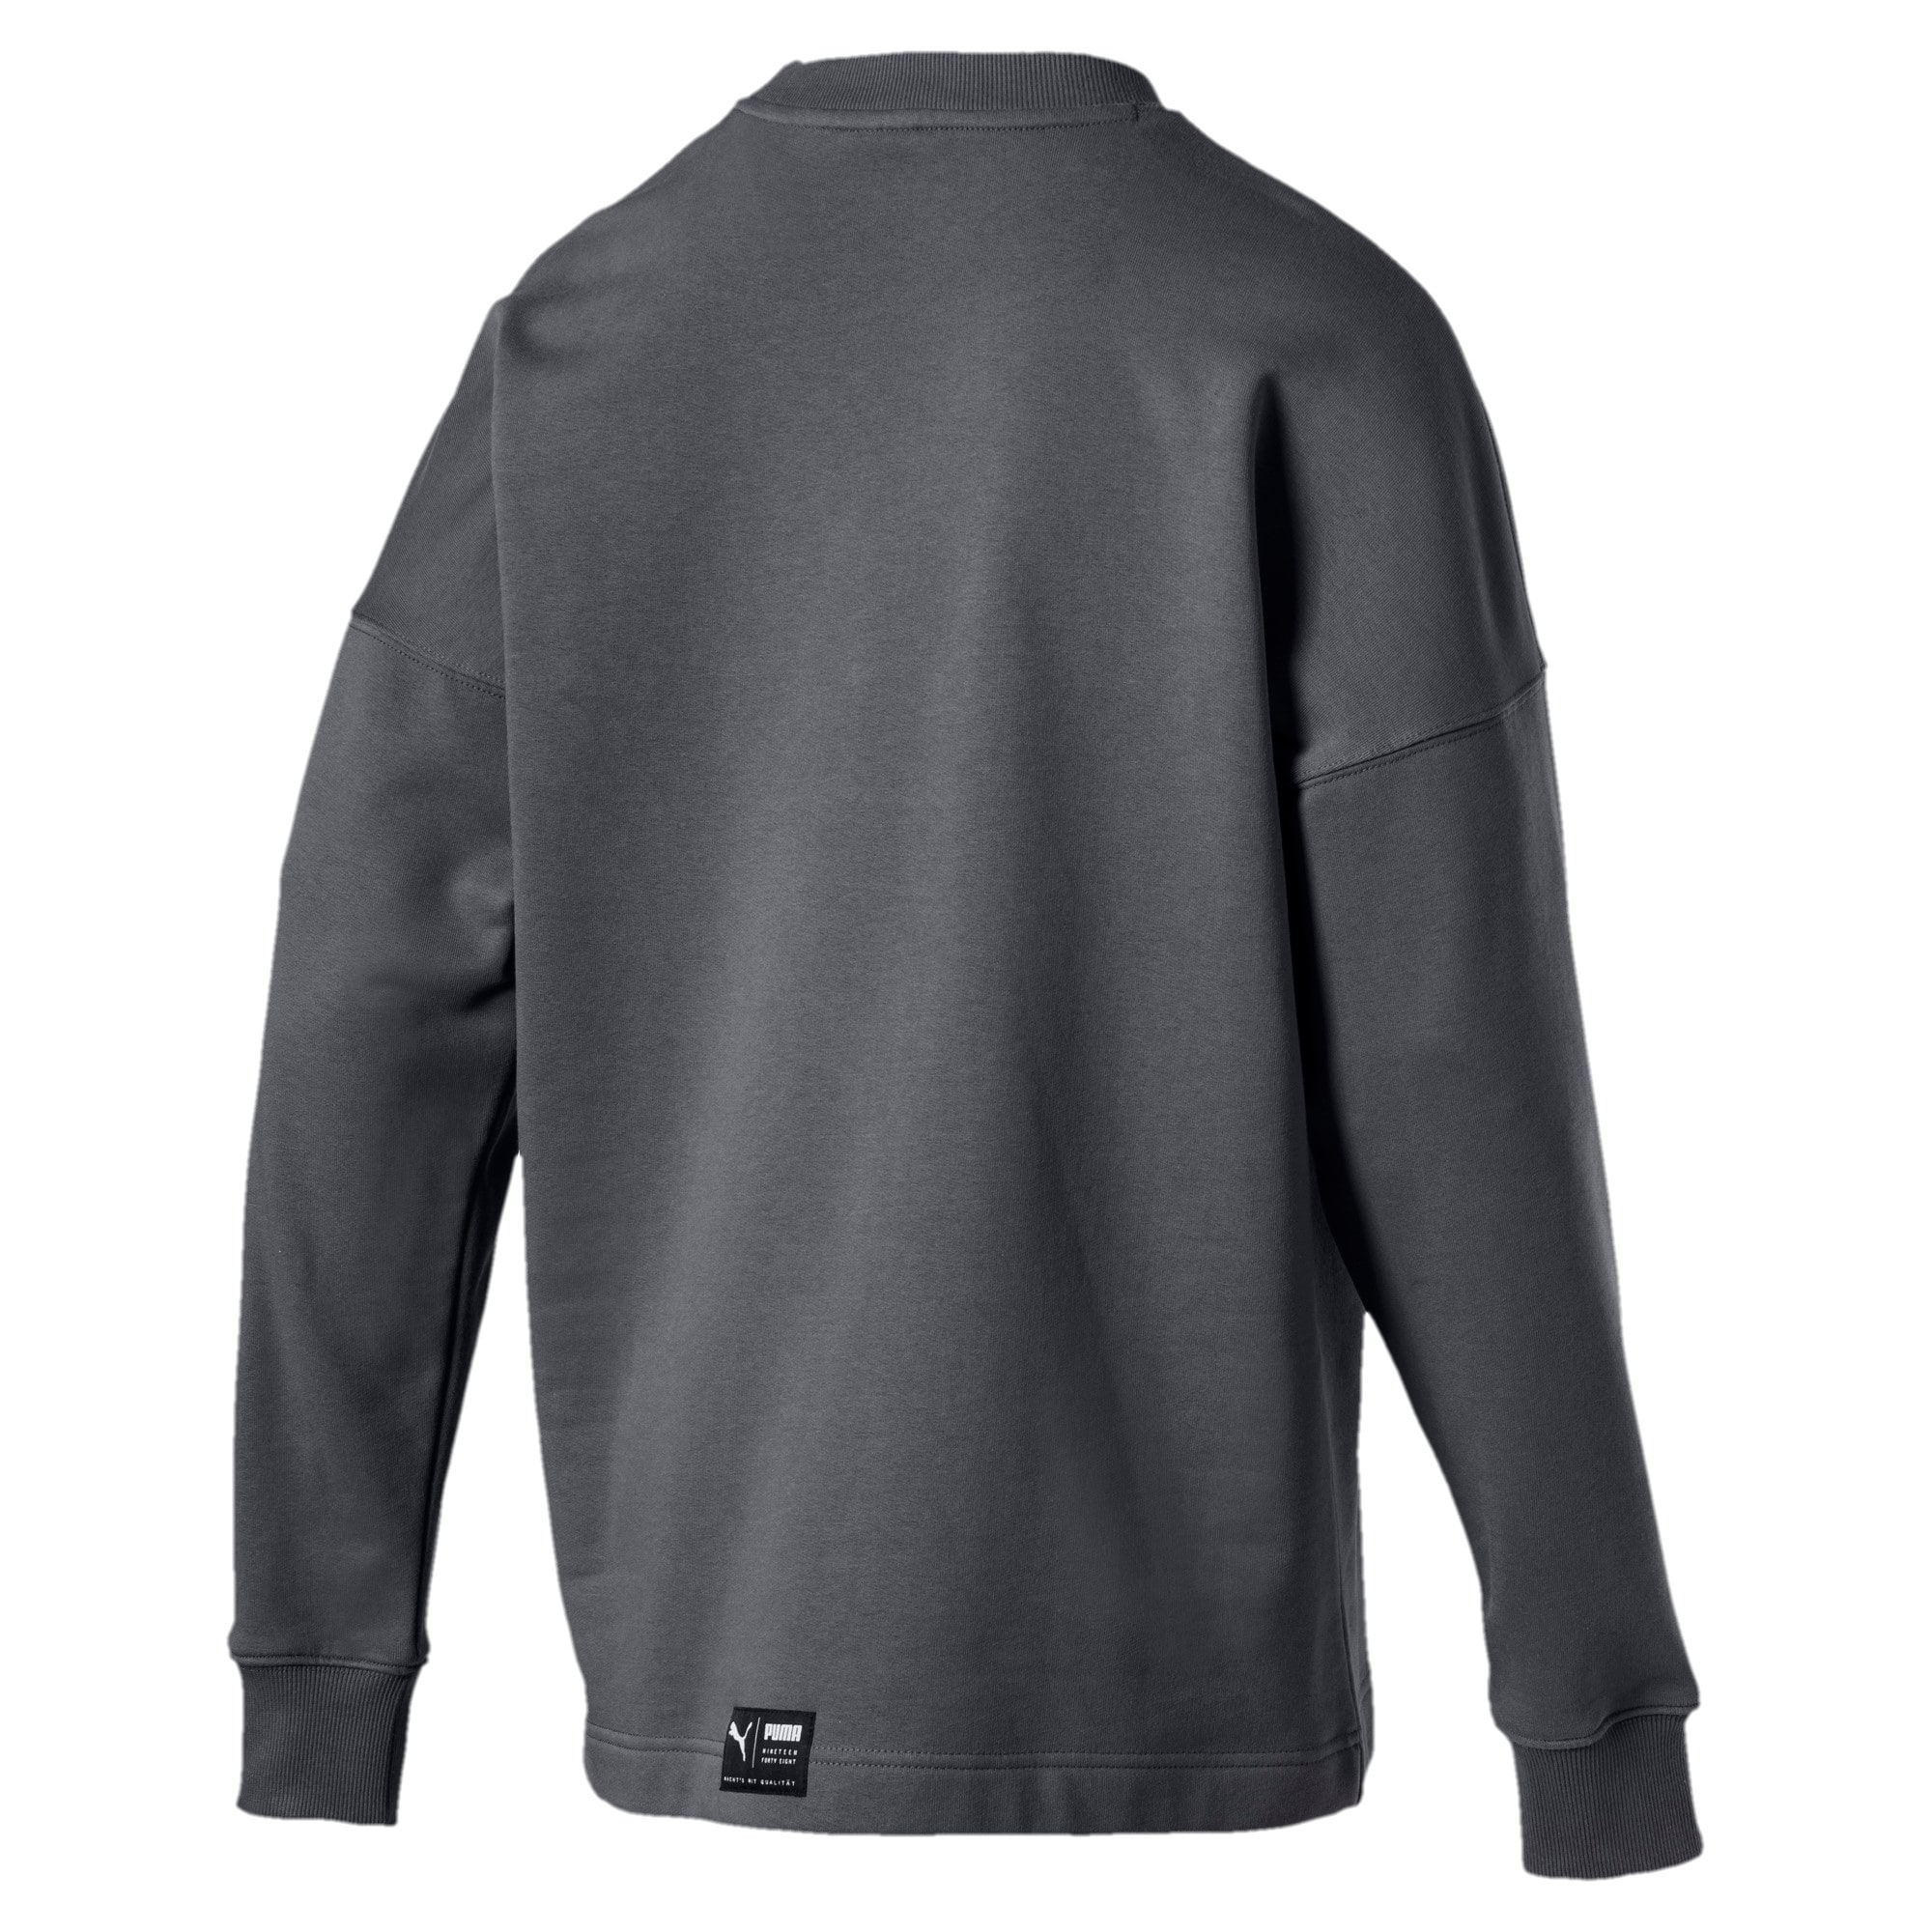 Thumbnail 3 of Classics Men's Downtown Sweater, Iron Gate, medium